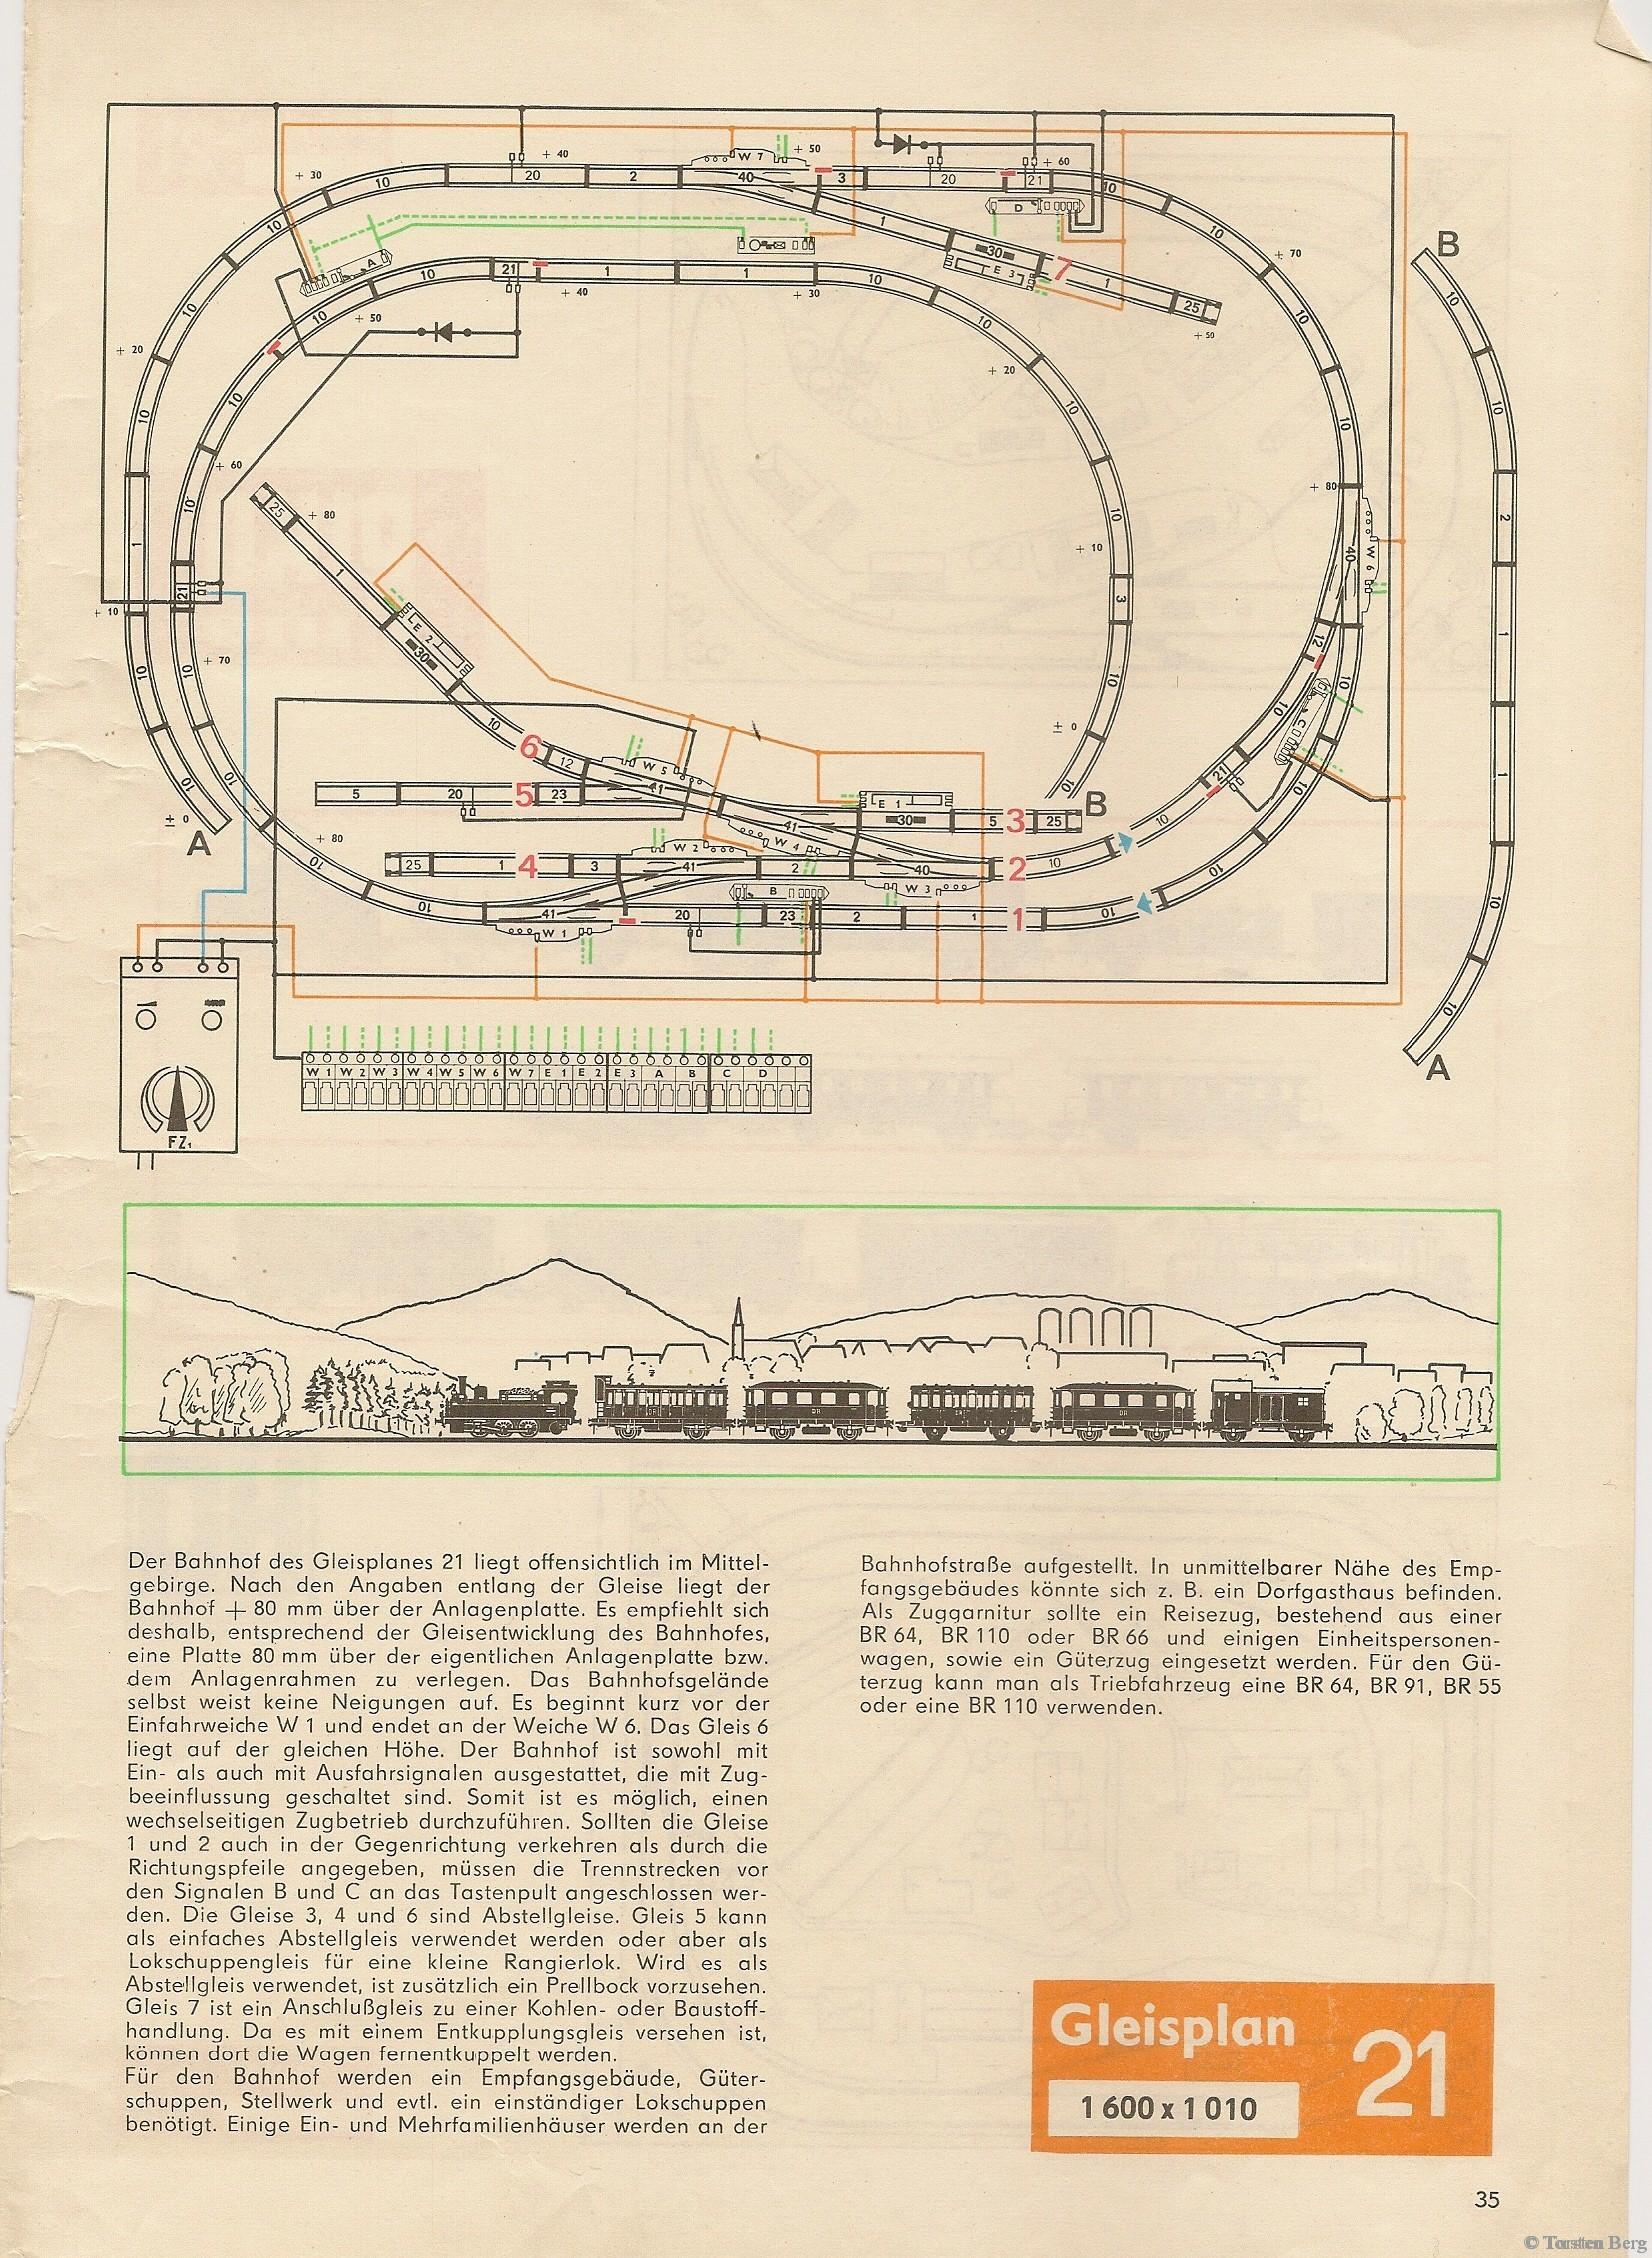 36 PIKO Standardgleis-Gleisplan 21